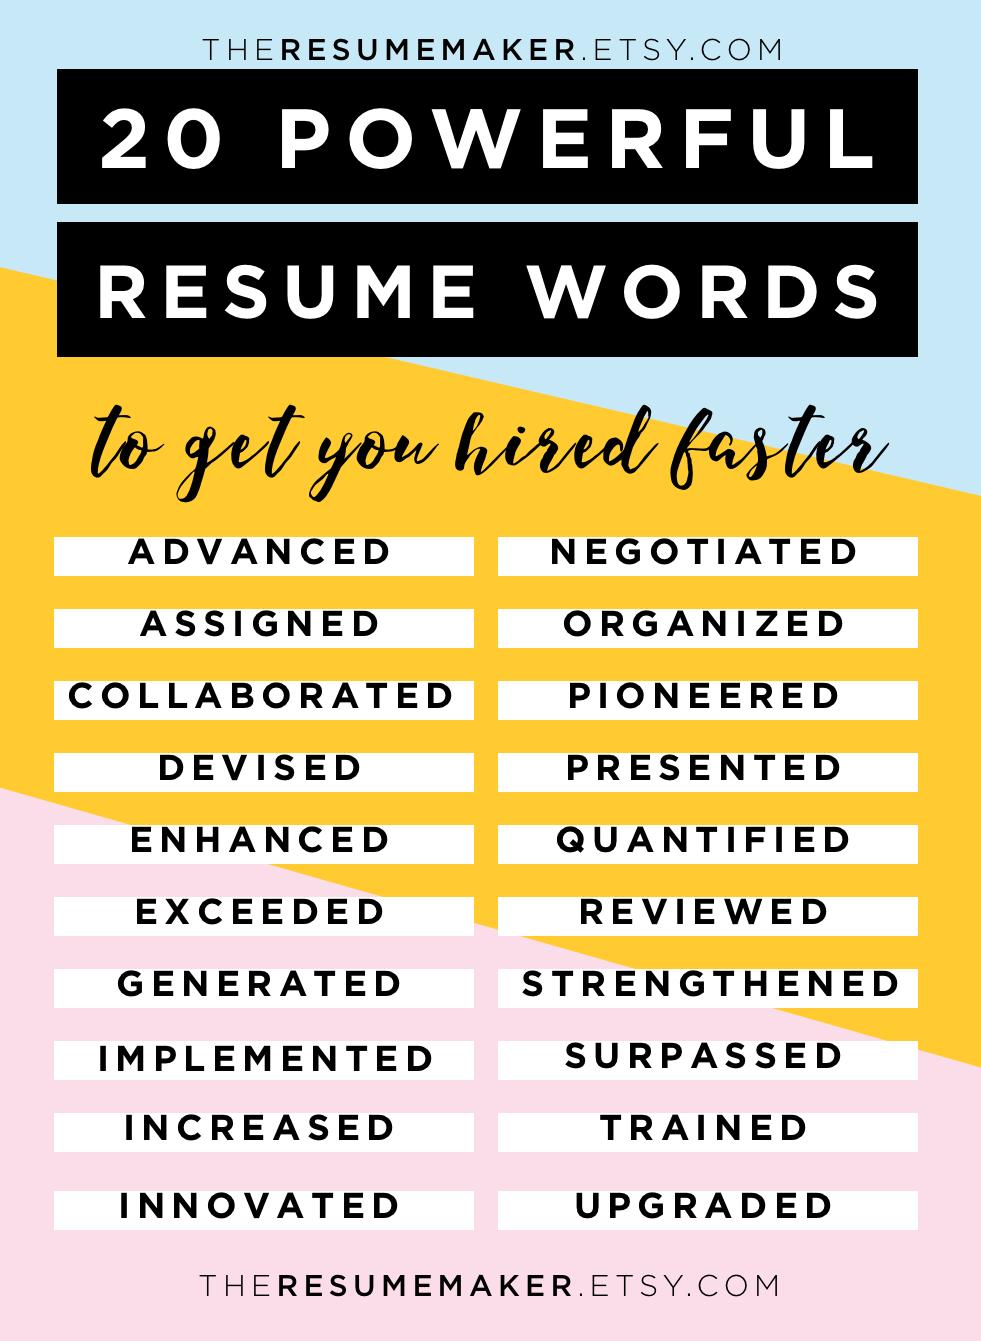 Resume Power Words Free Resume Tips Resume Template Resume Words Action Words Resume Tips College Resume He Resume Power Words Resume Advice Resume Words